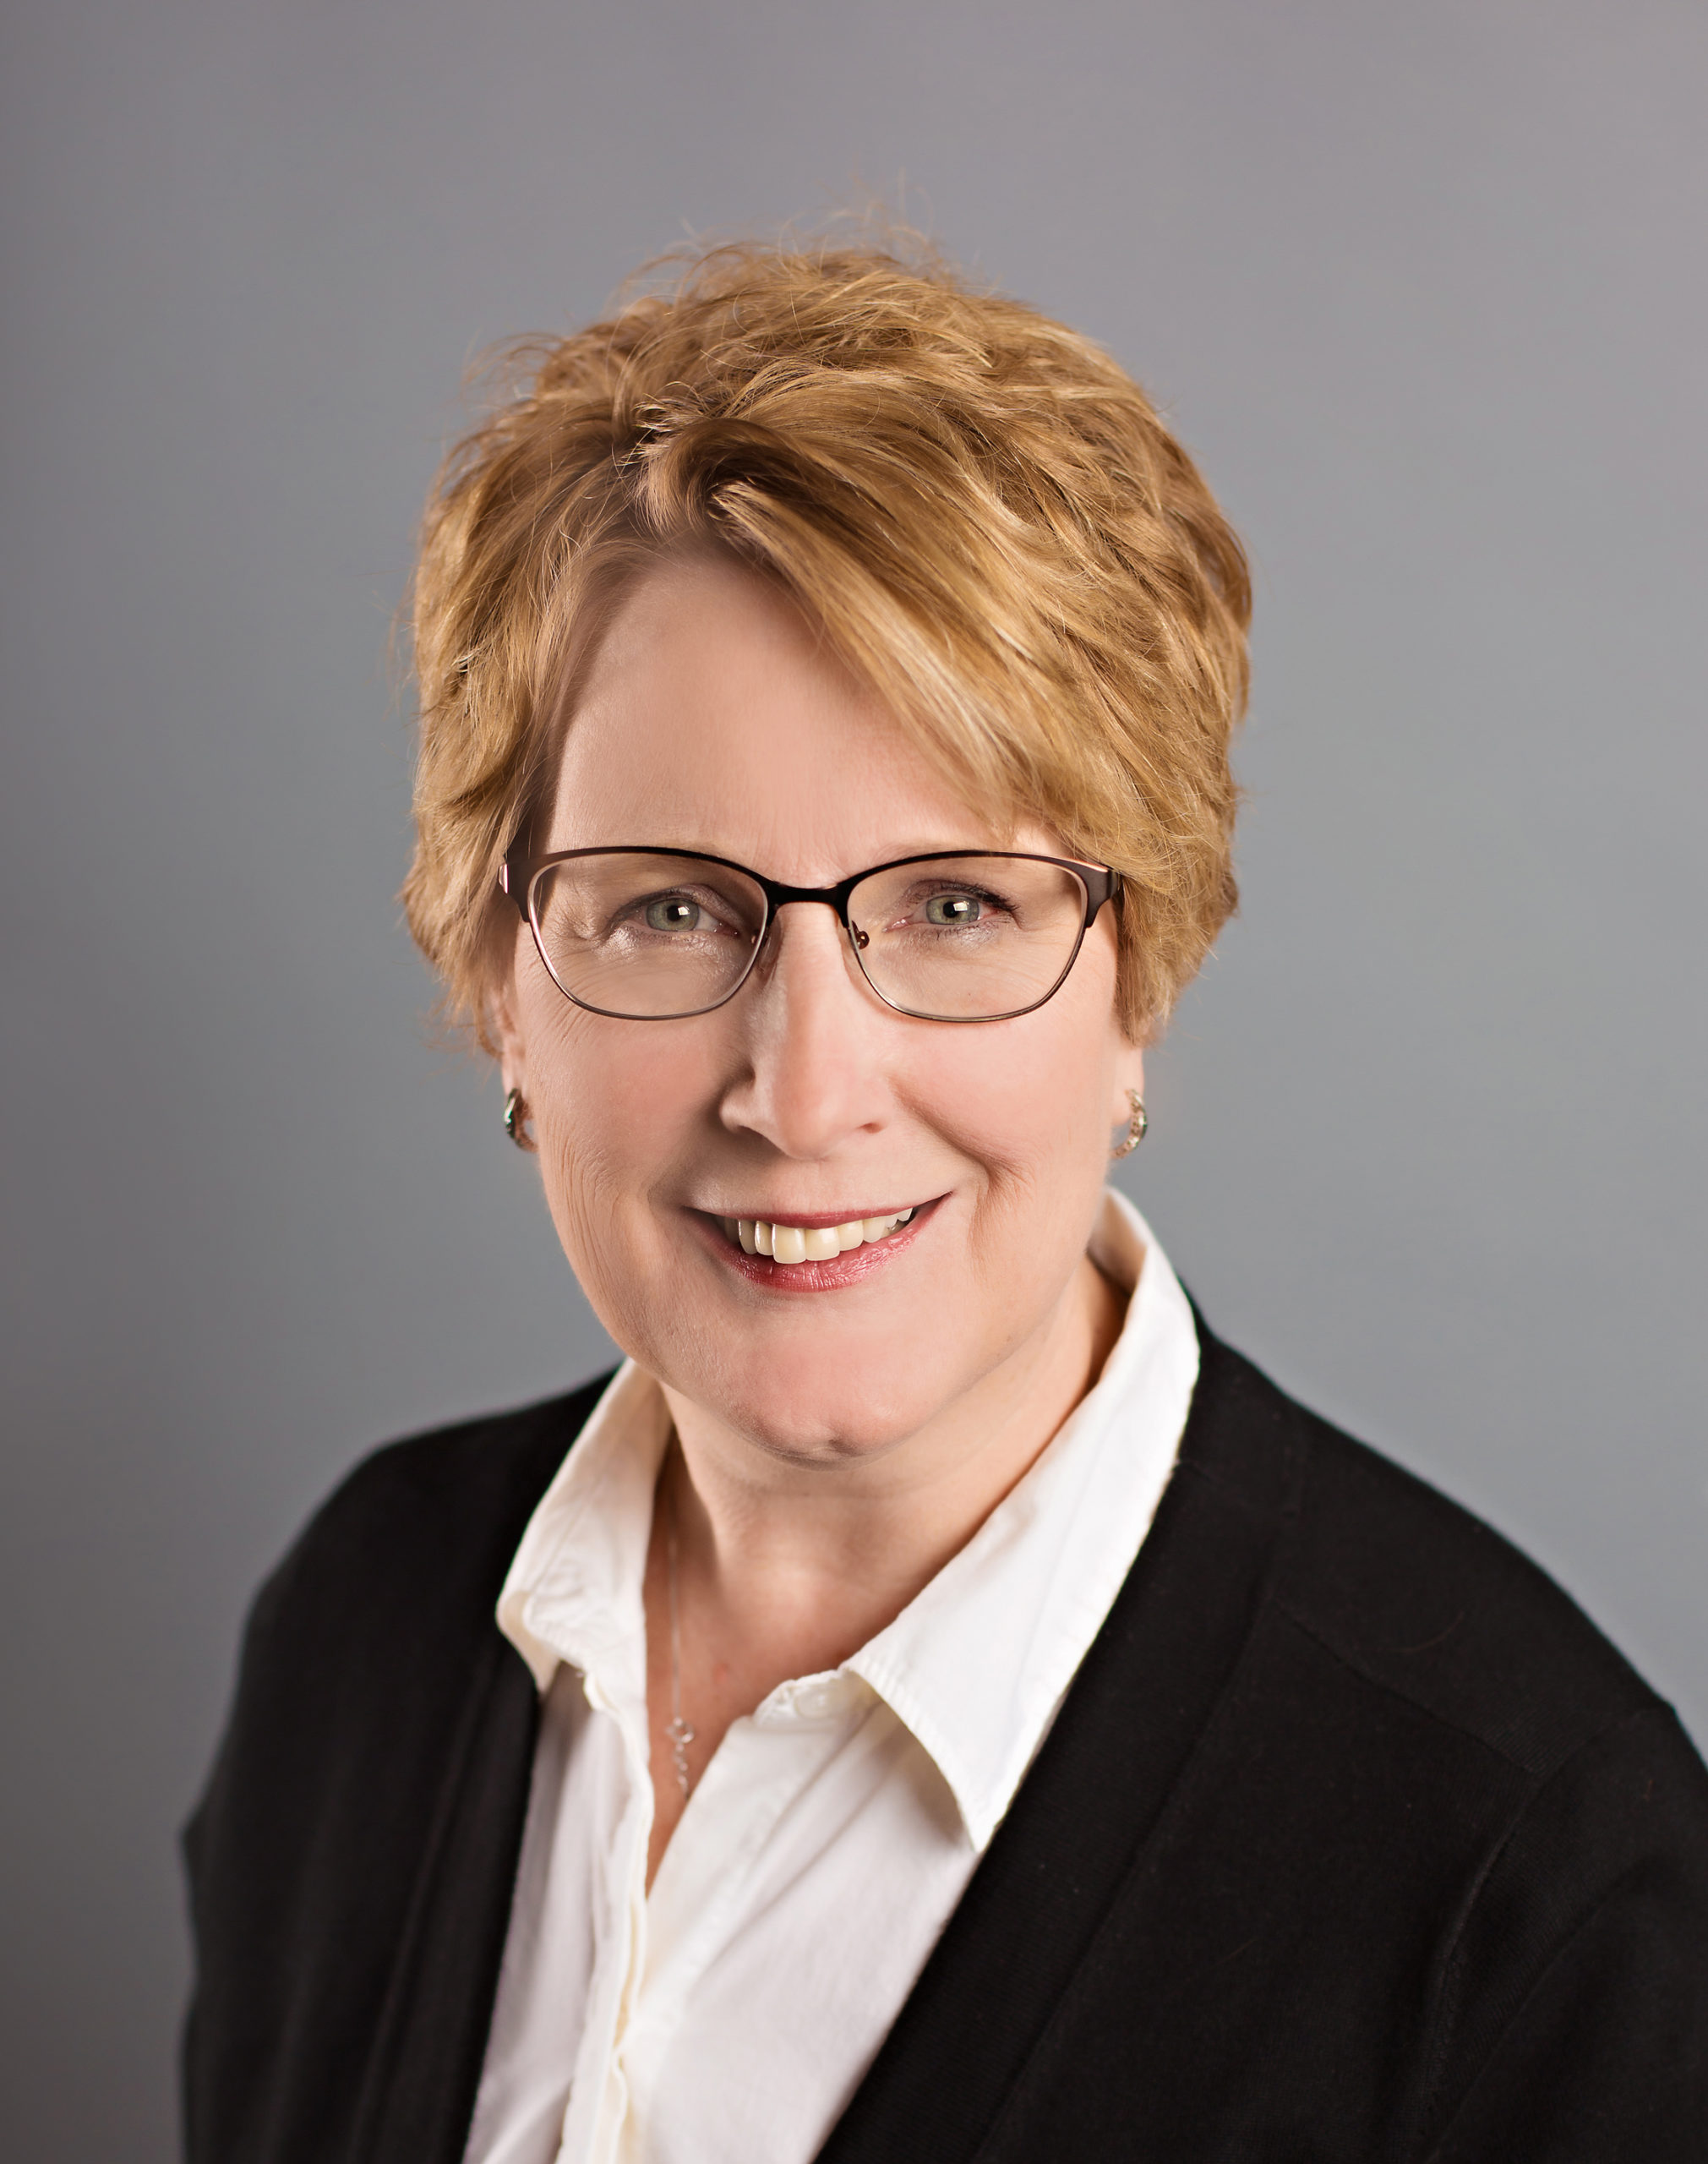 Kathy Ditsworth